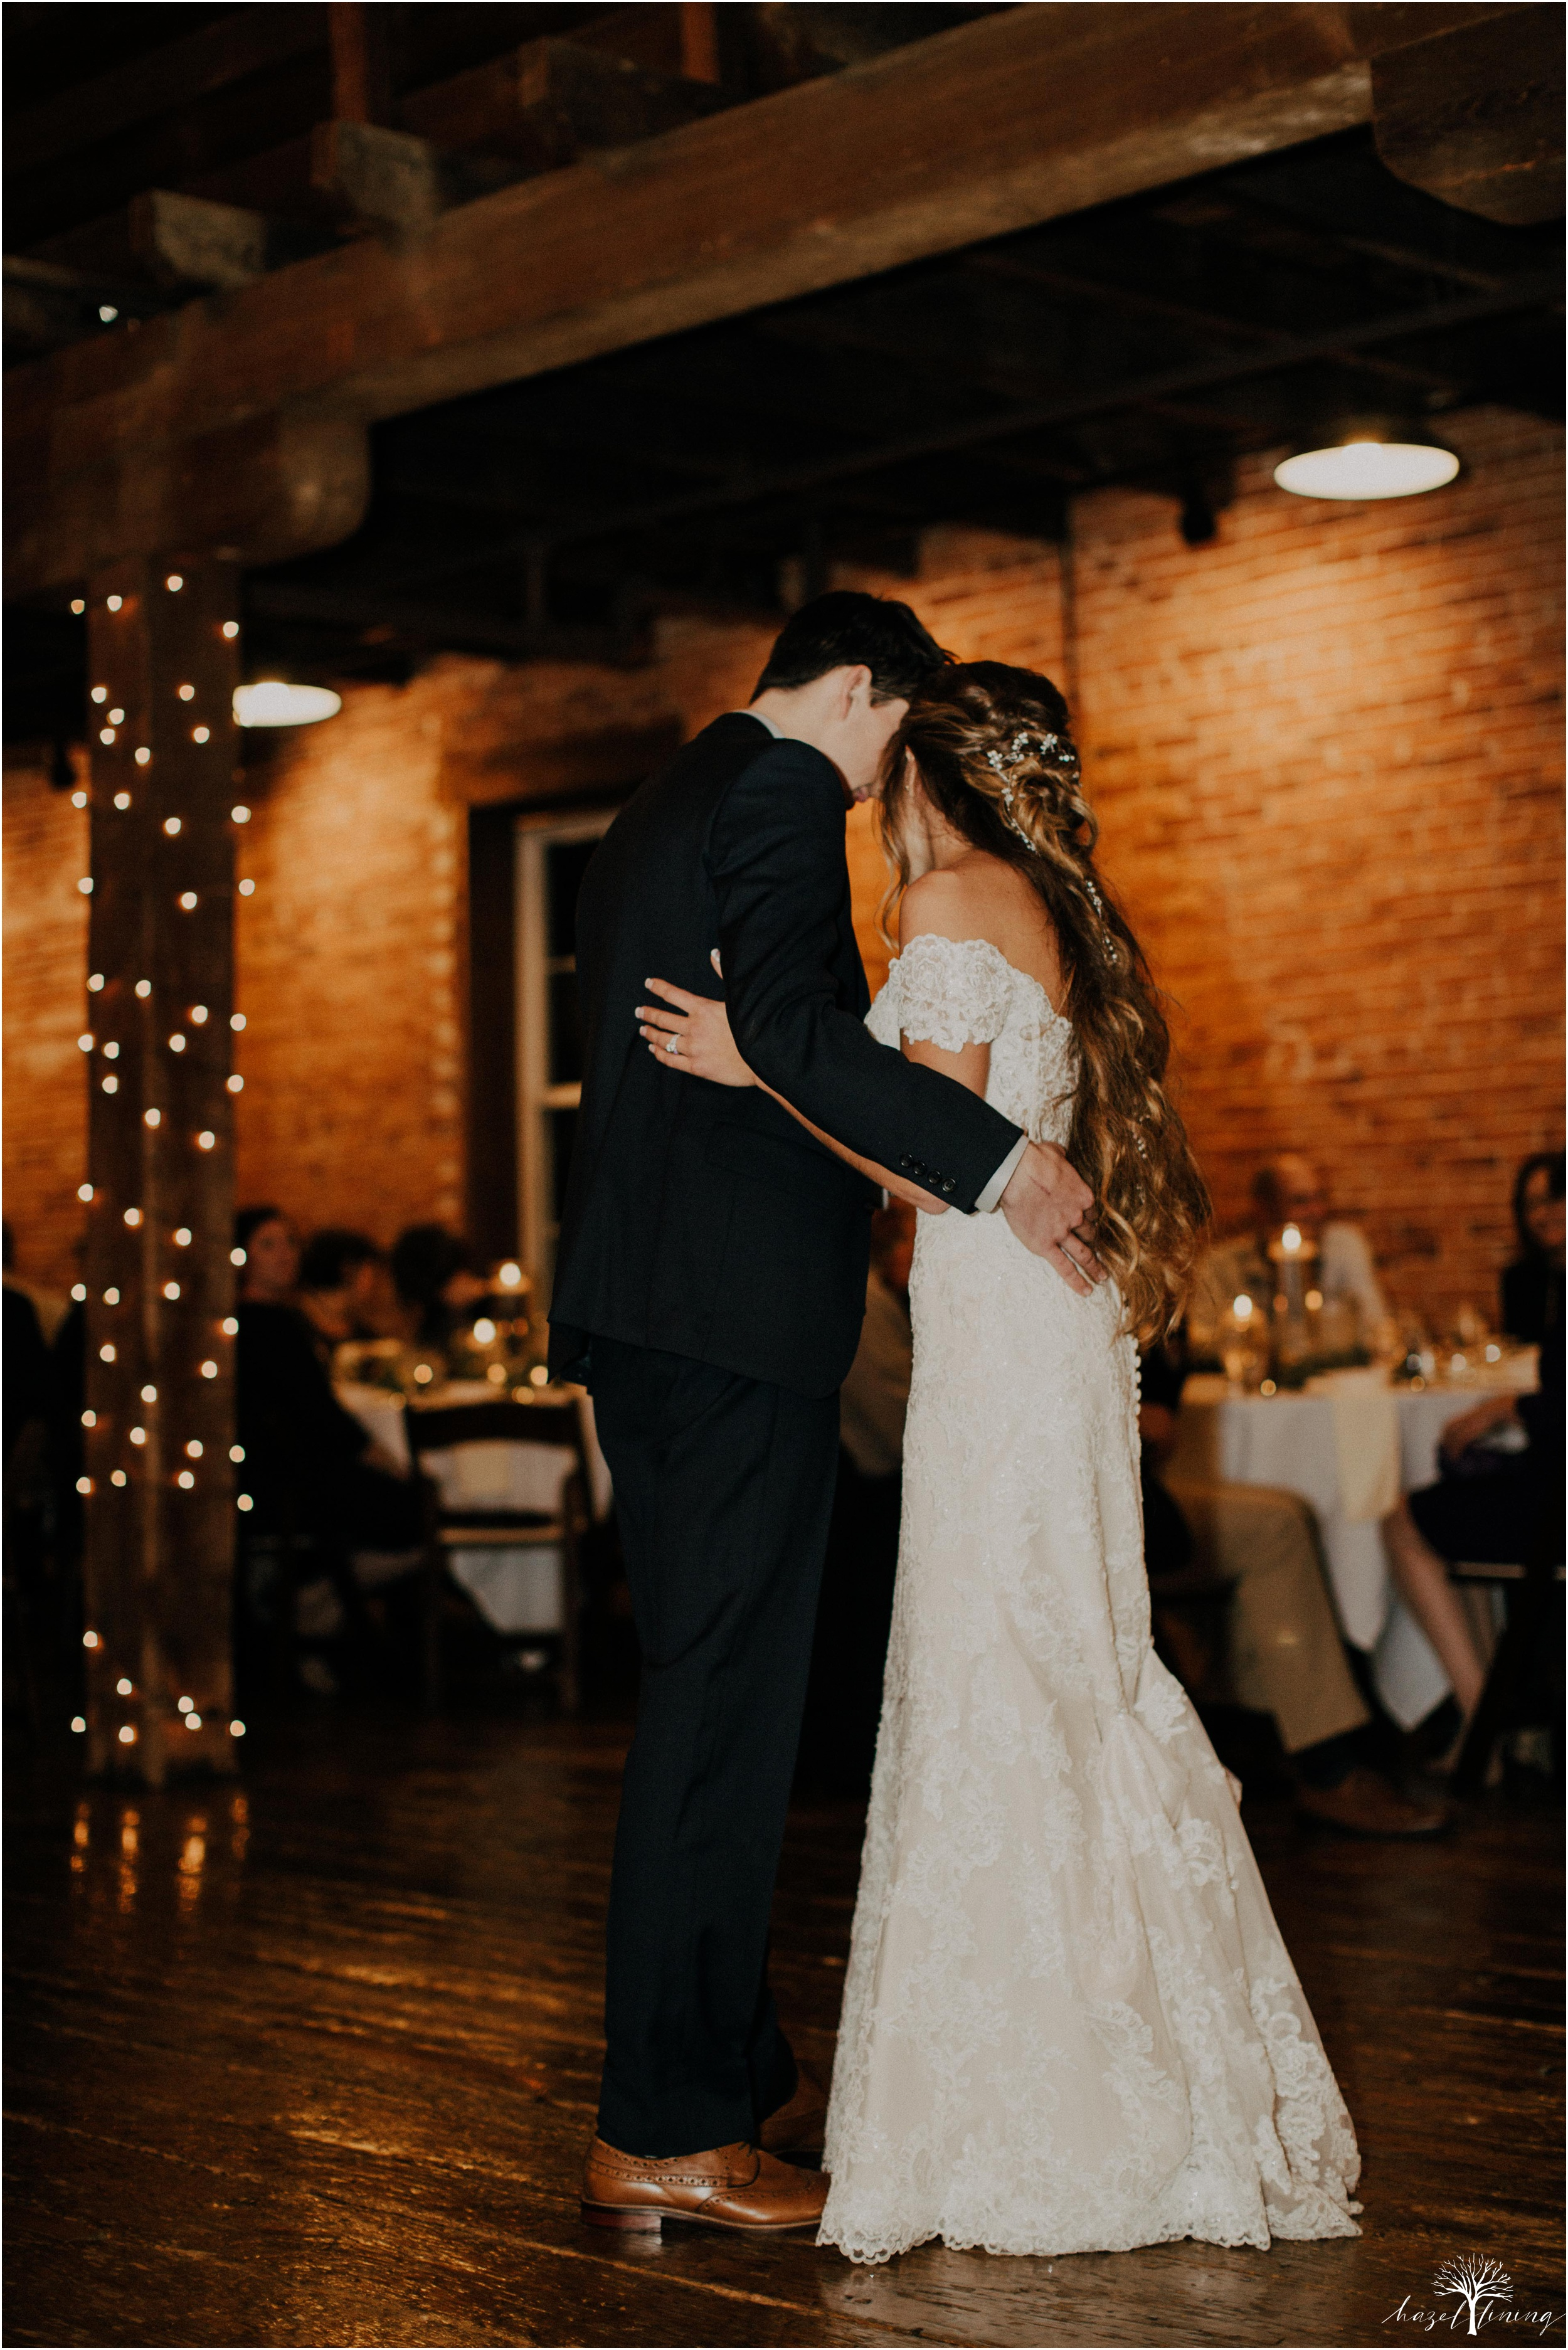 emma-matt-gehringer-the-booking-house-lancaster-manhiem-pennsylvania-winter-wedding_0143.jpg